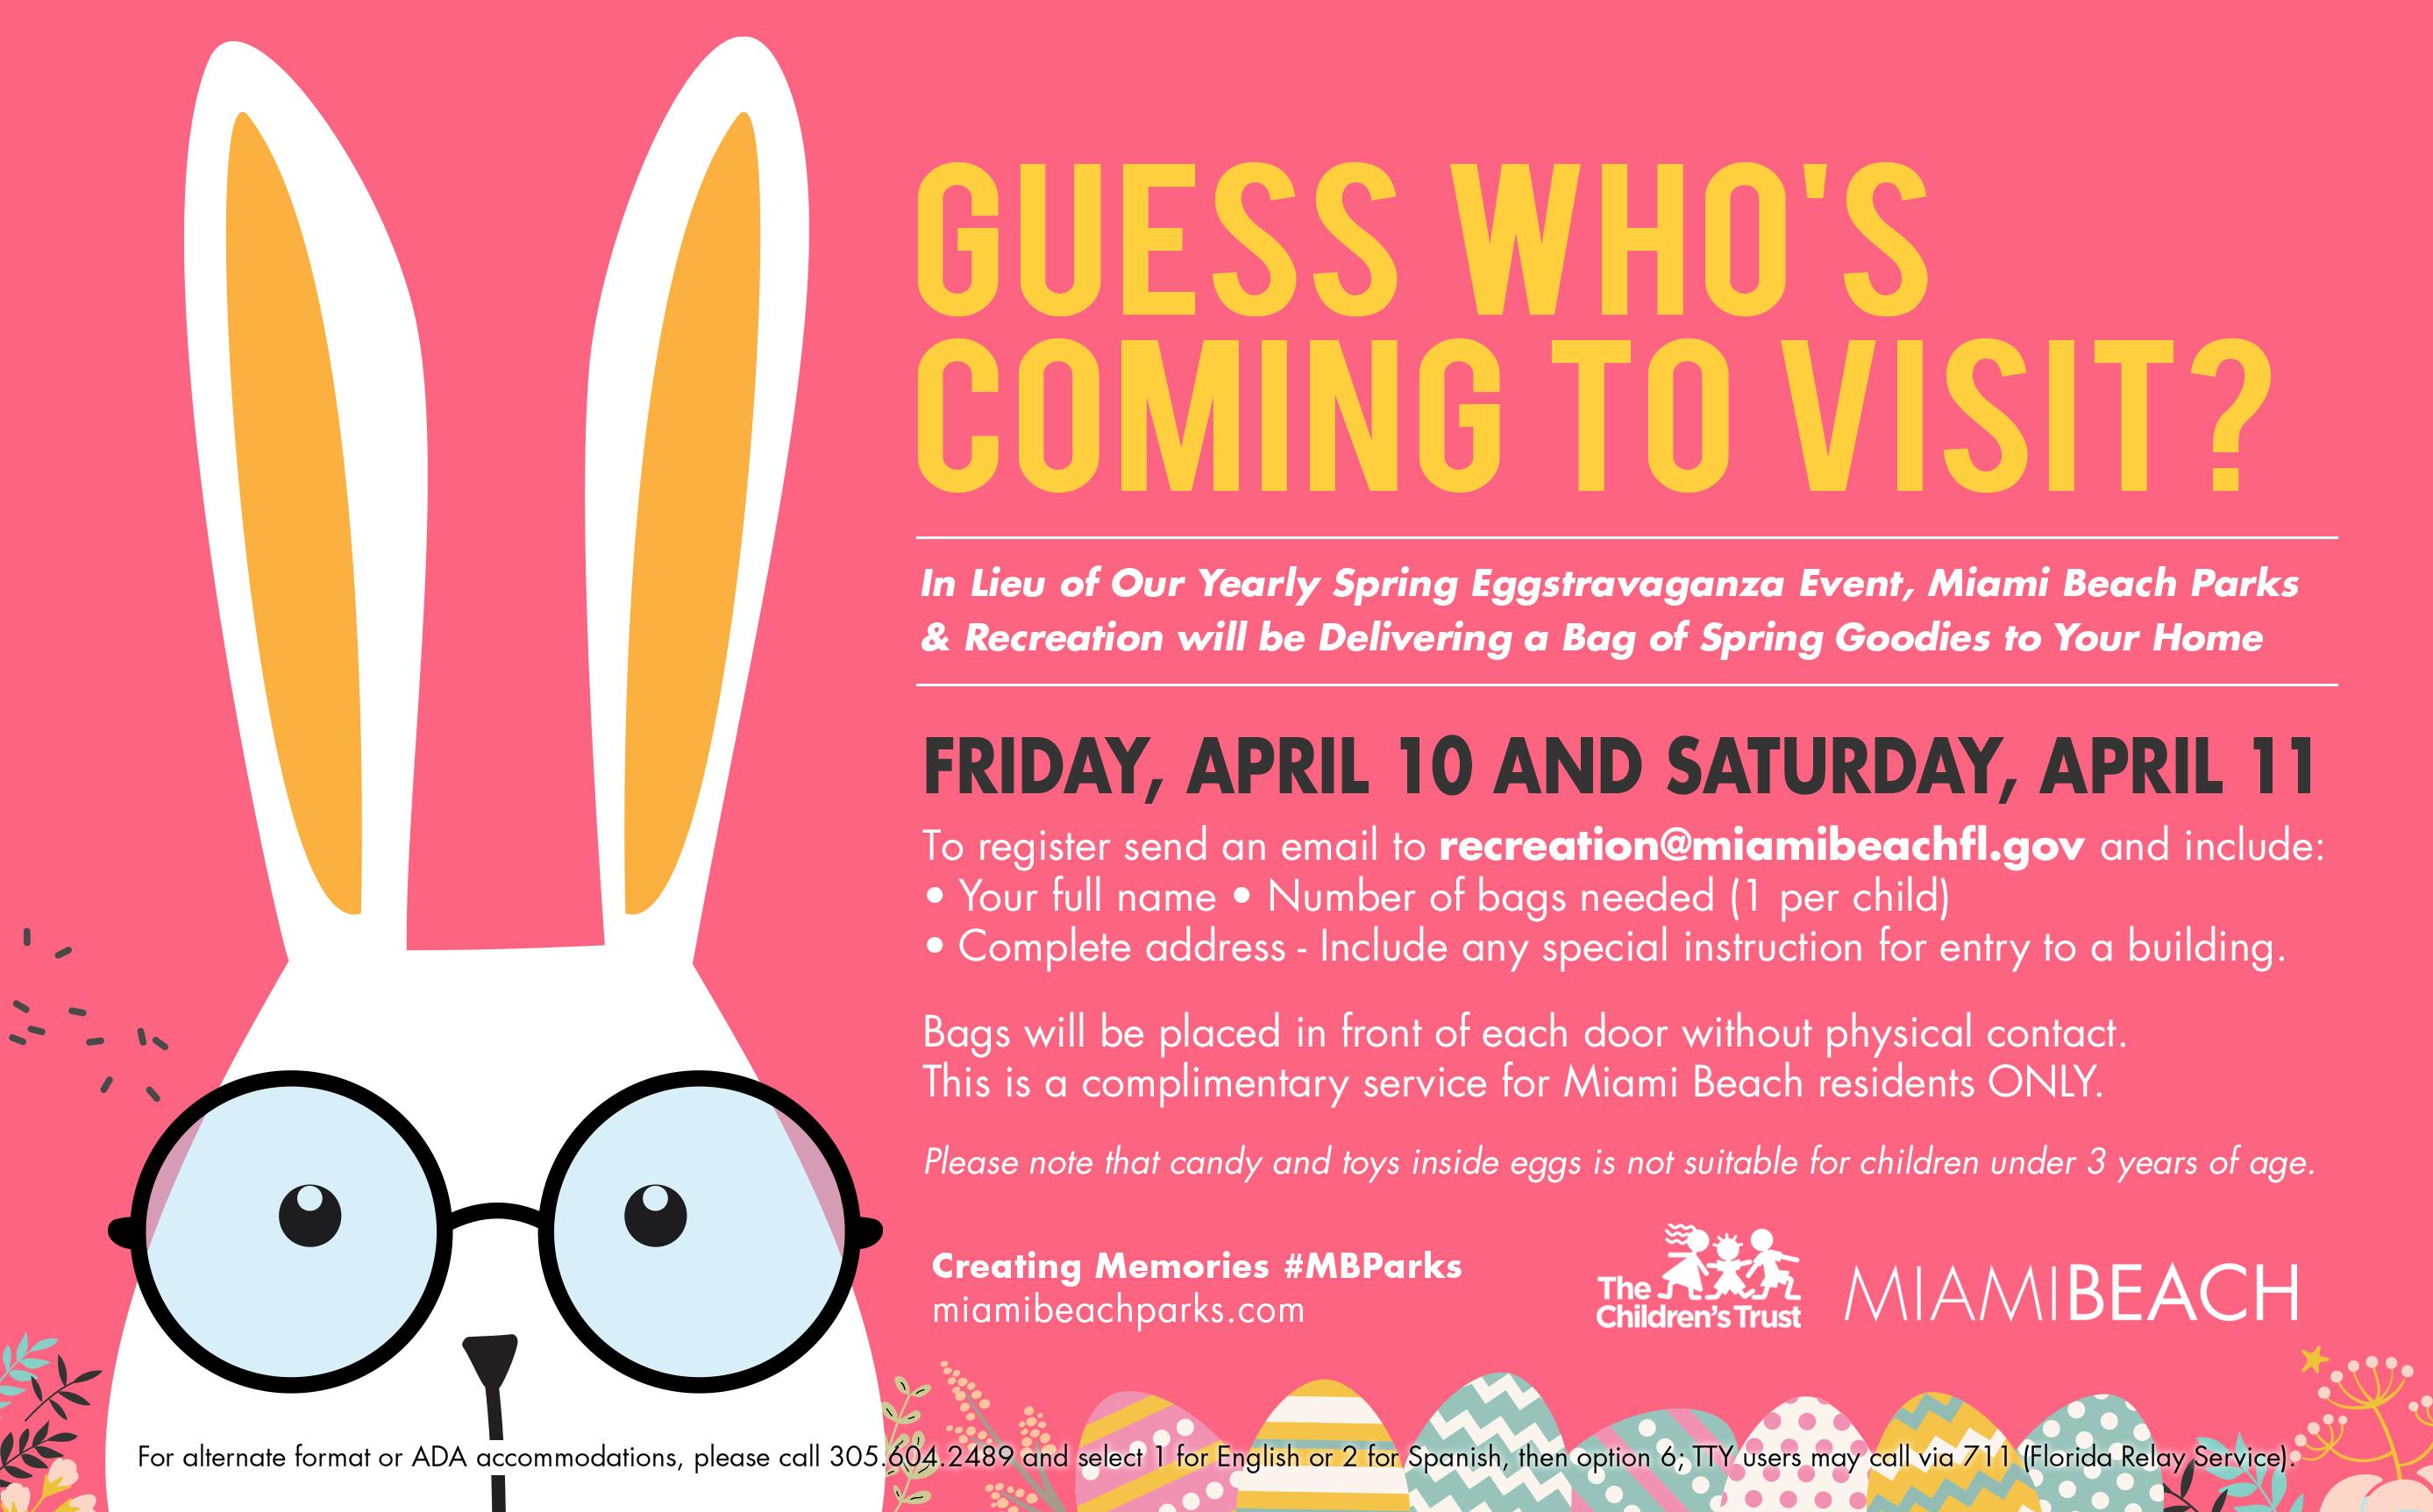 https://www.miamibeachfl.gov/wp-content/uploads/2020/04/Spring-Eggstravaganza_FB-Posting_FINAL.jpg